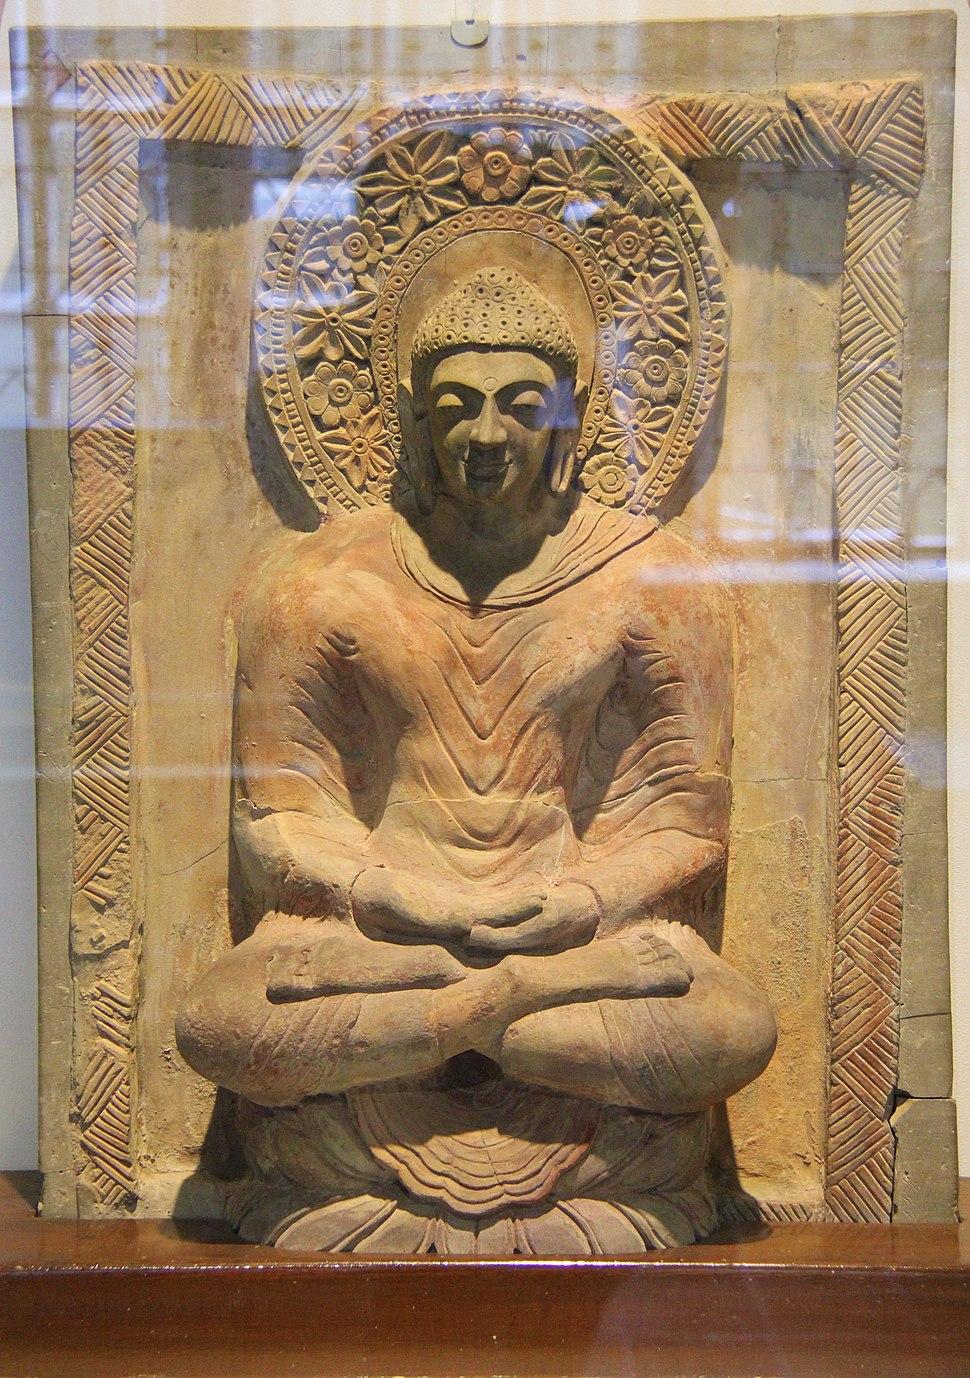 Gautama Buddha statue (5th century CE)